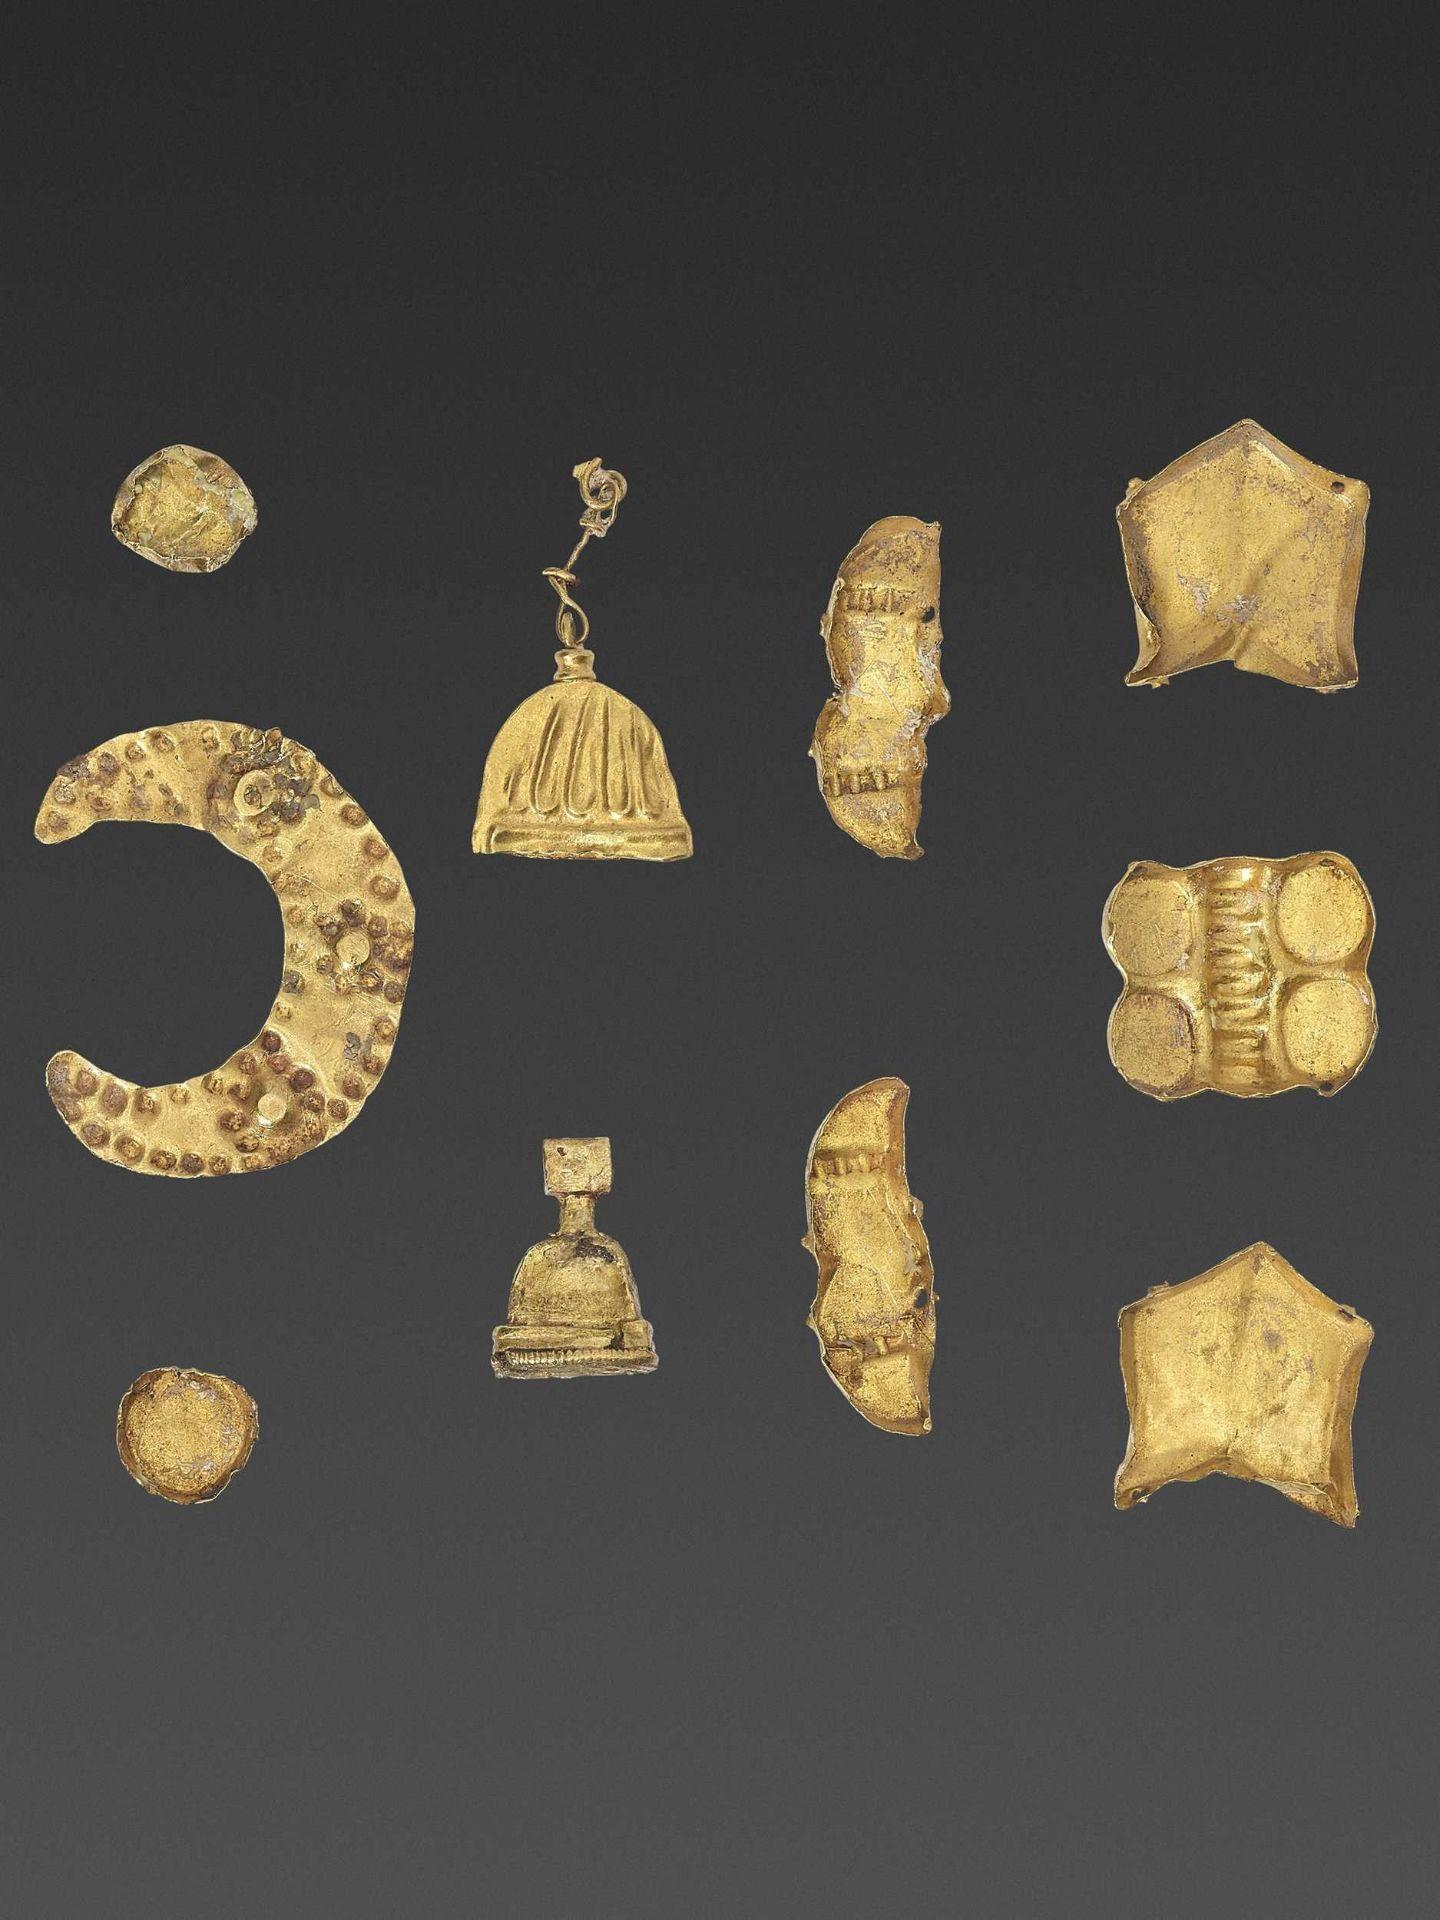 19 BACTRIAN GOLD GARMENT ORNAMENTS - Bild 5 aus 5